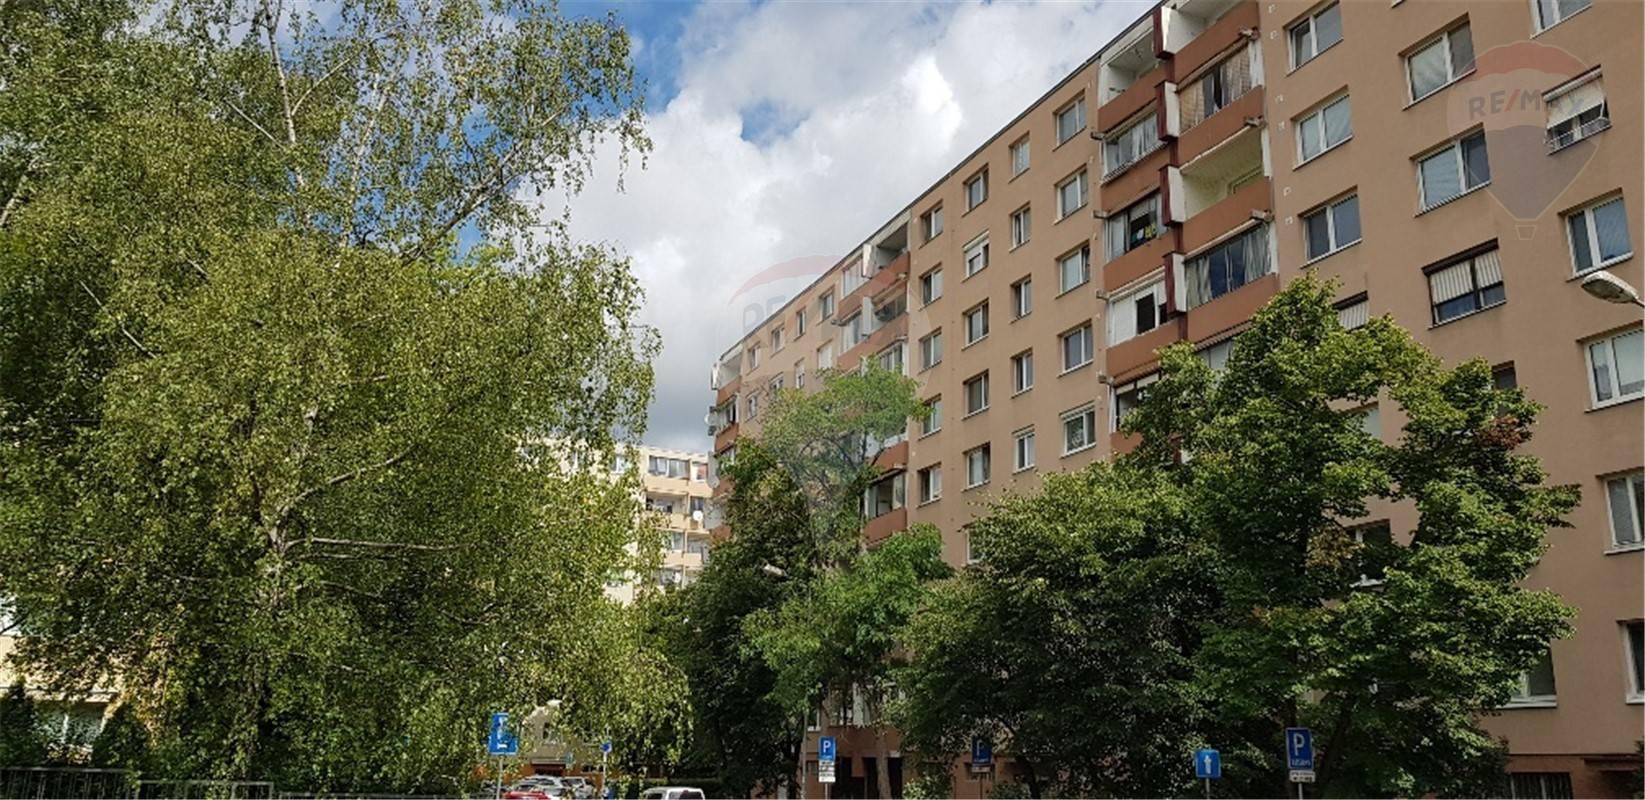 Predaj bytu (2 izbový) 55 m2, Bratislava - Dúbravka -